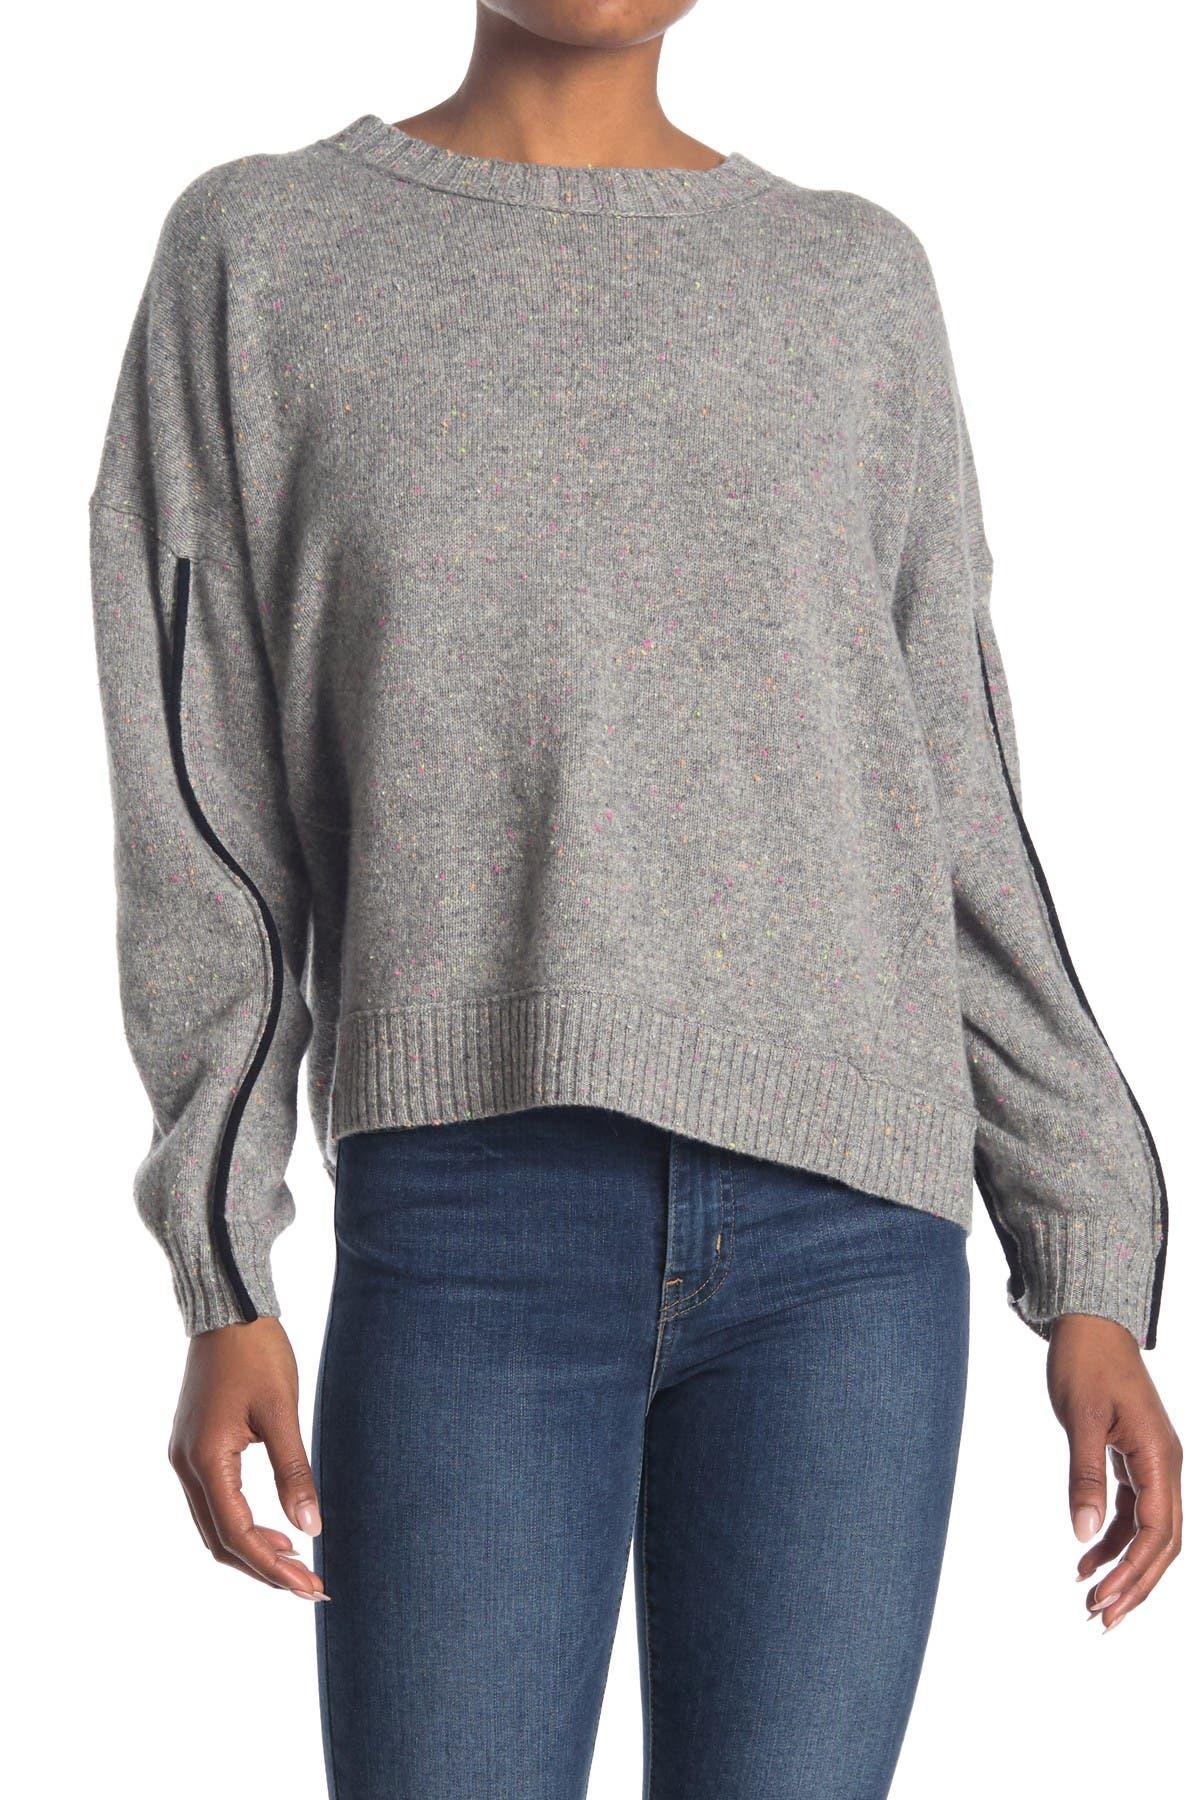 Image of Brochu Walker Luci Cashmere Pullover Sweatshirt